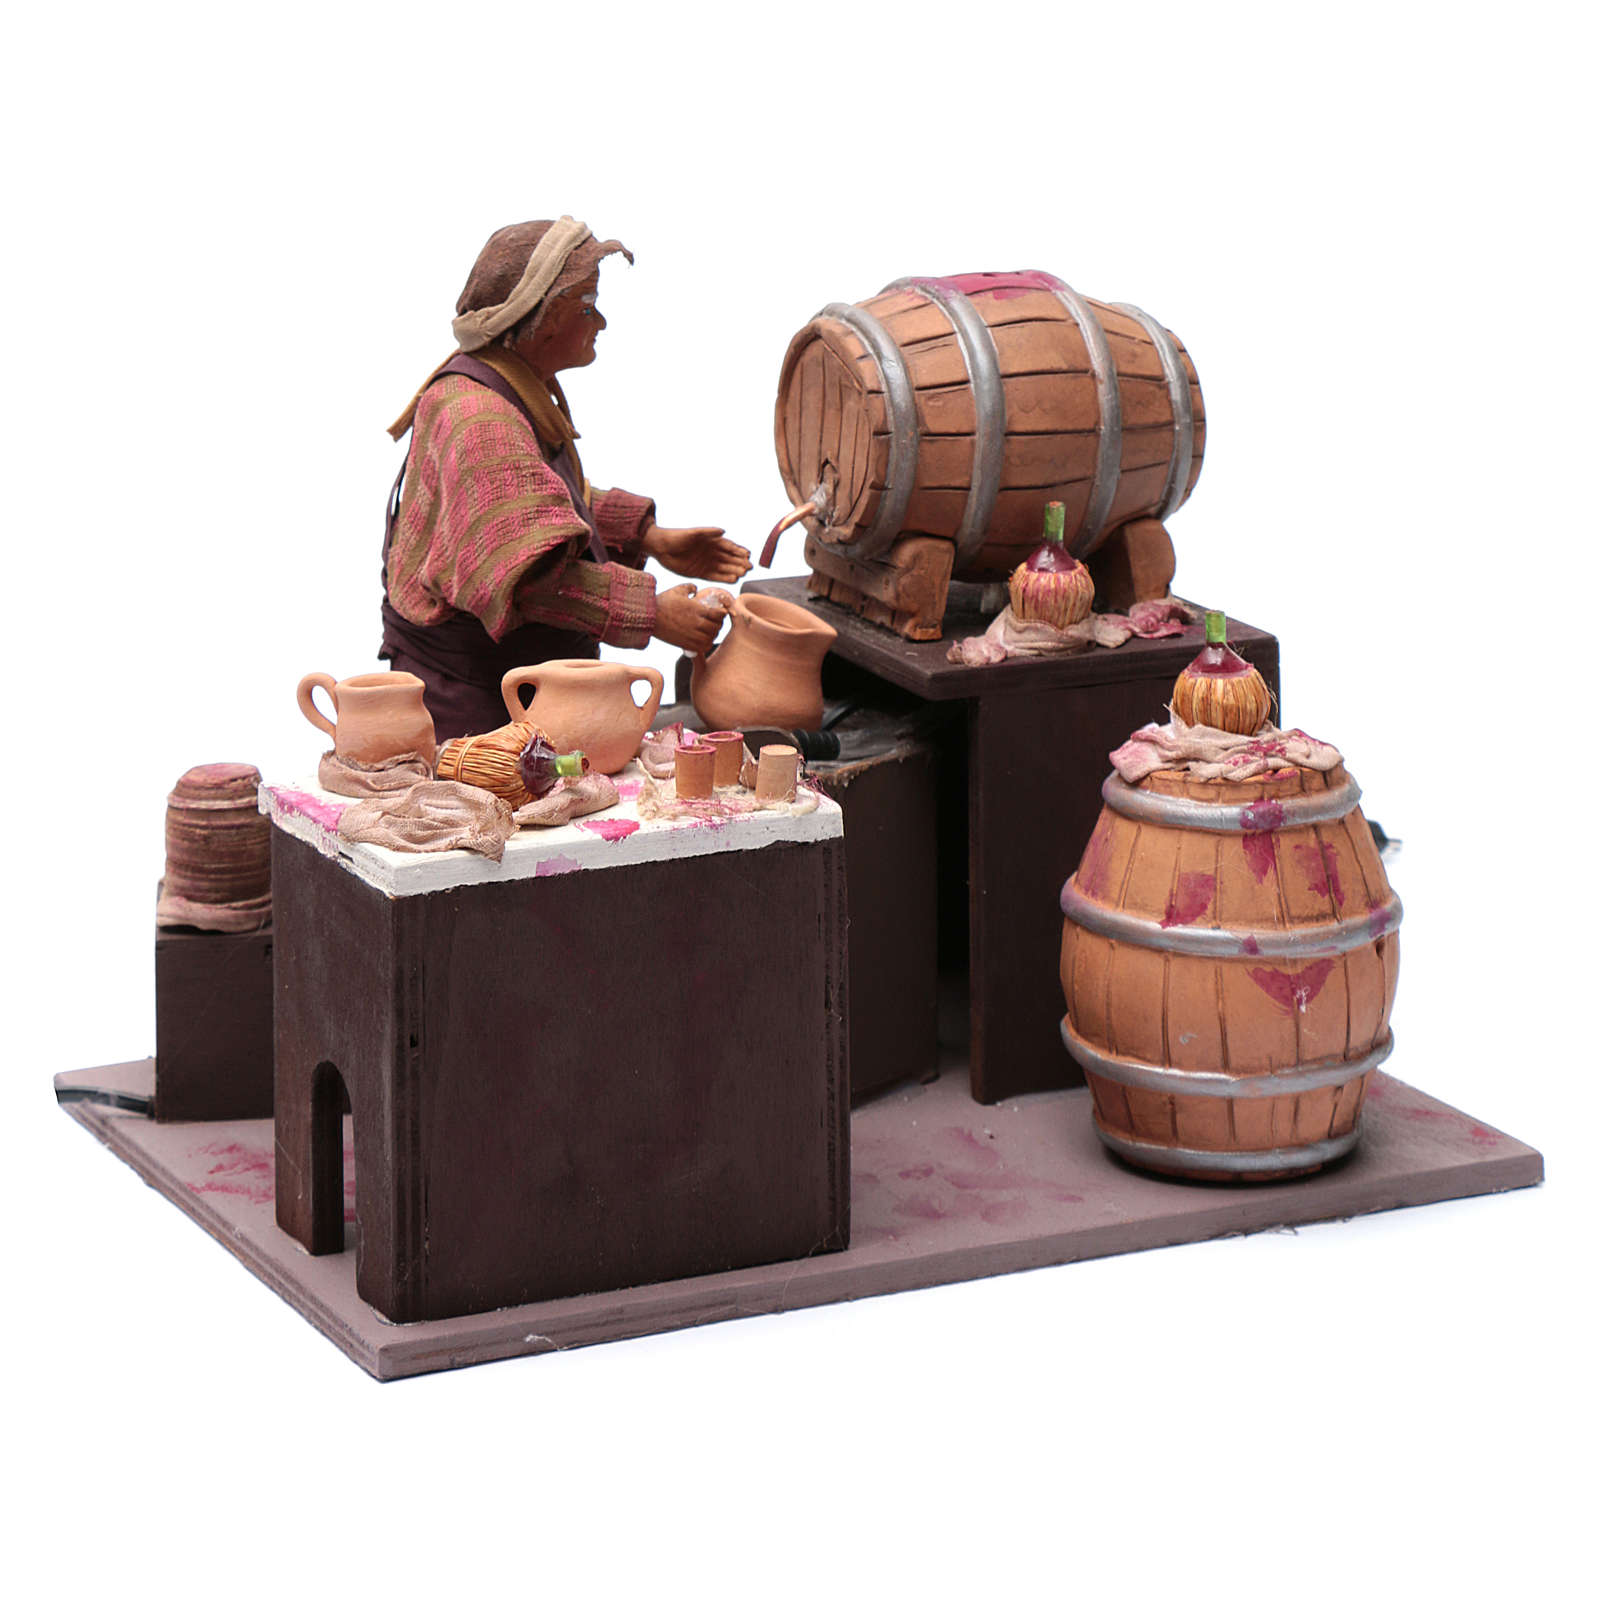 Comerciante de vino con barriles 24 cm pesebre Nápoles 4